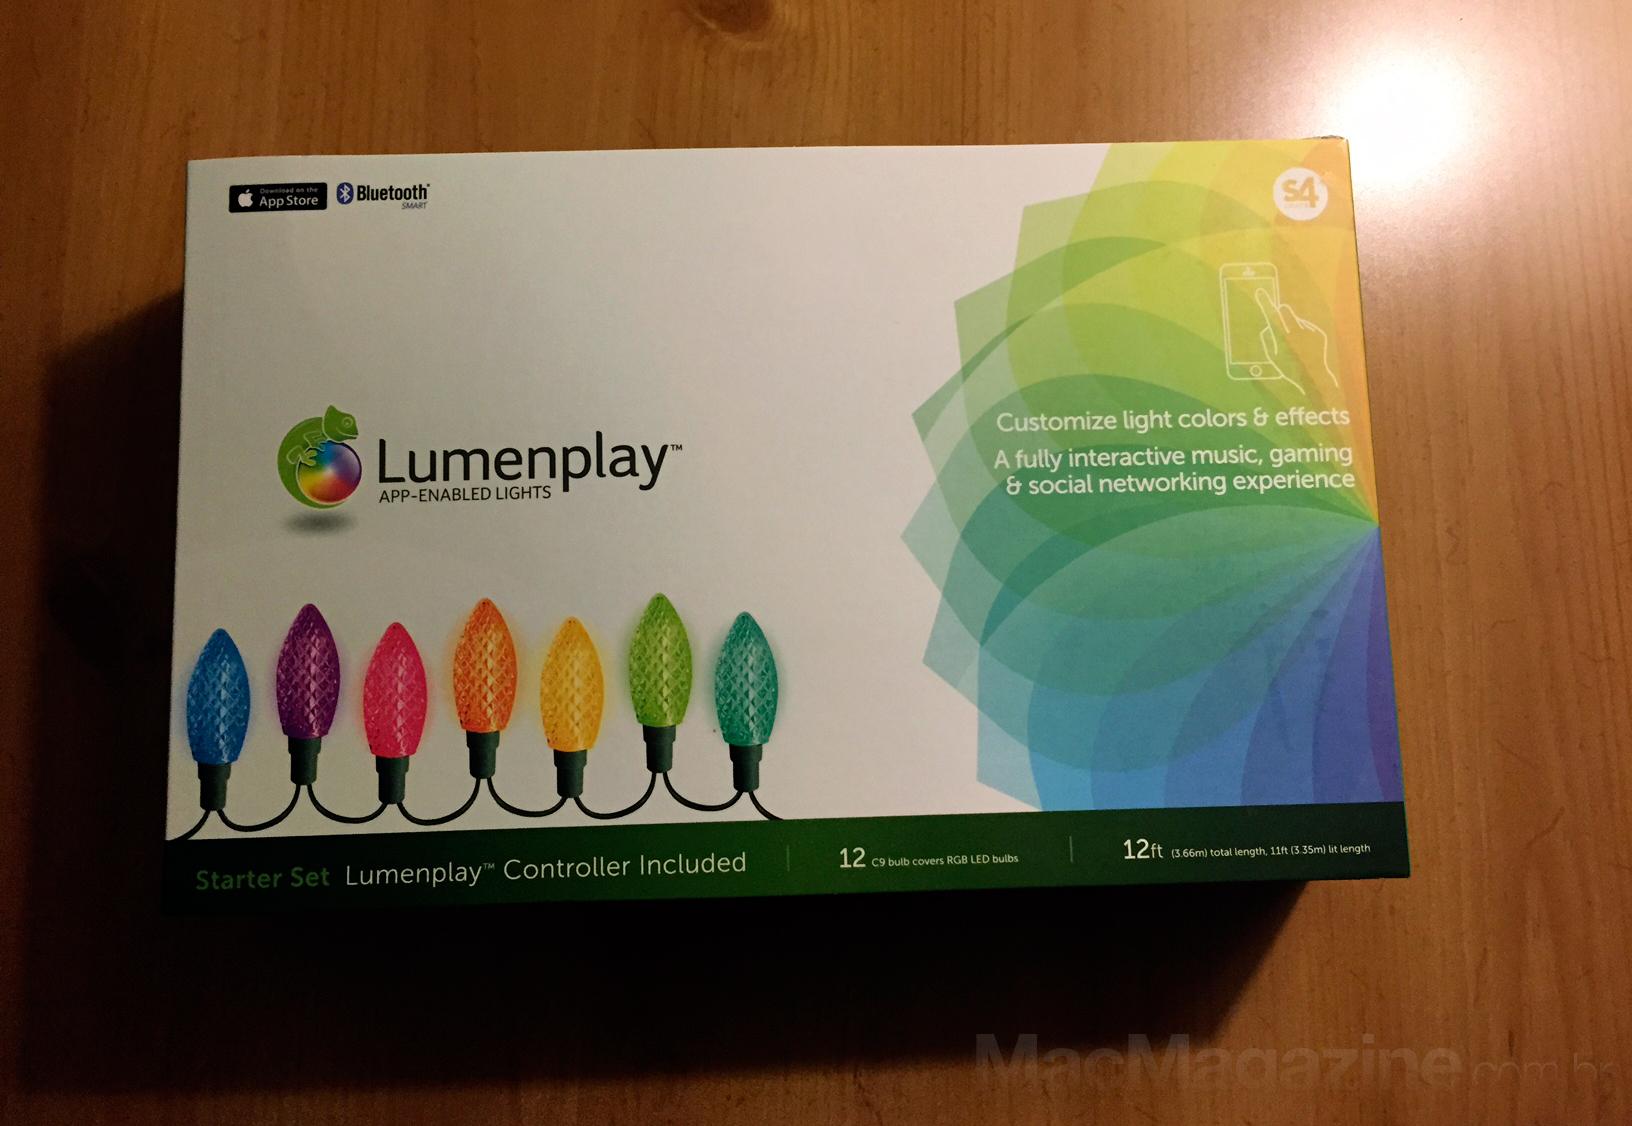 Lumenplay